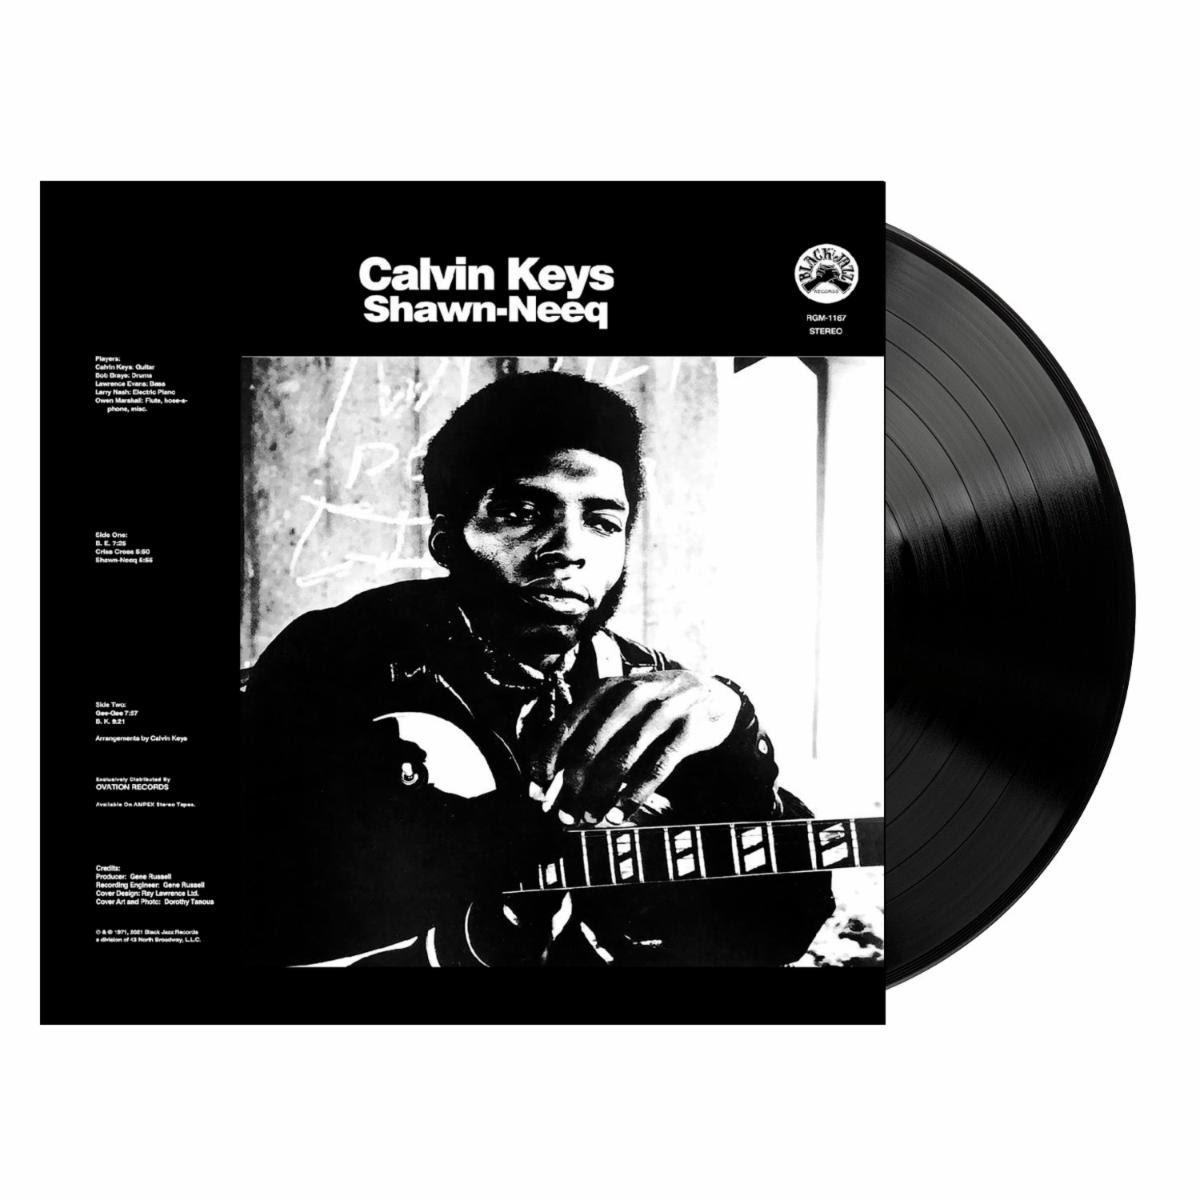 Clavin Keys Shawn-Nee Black Vinyl LP Packshot